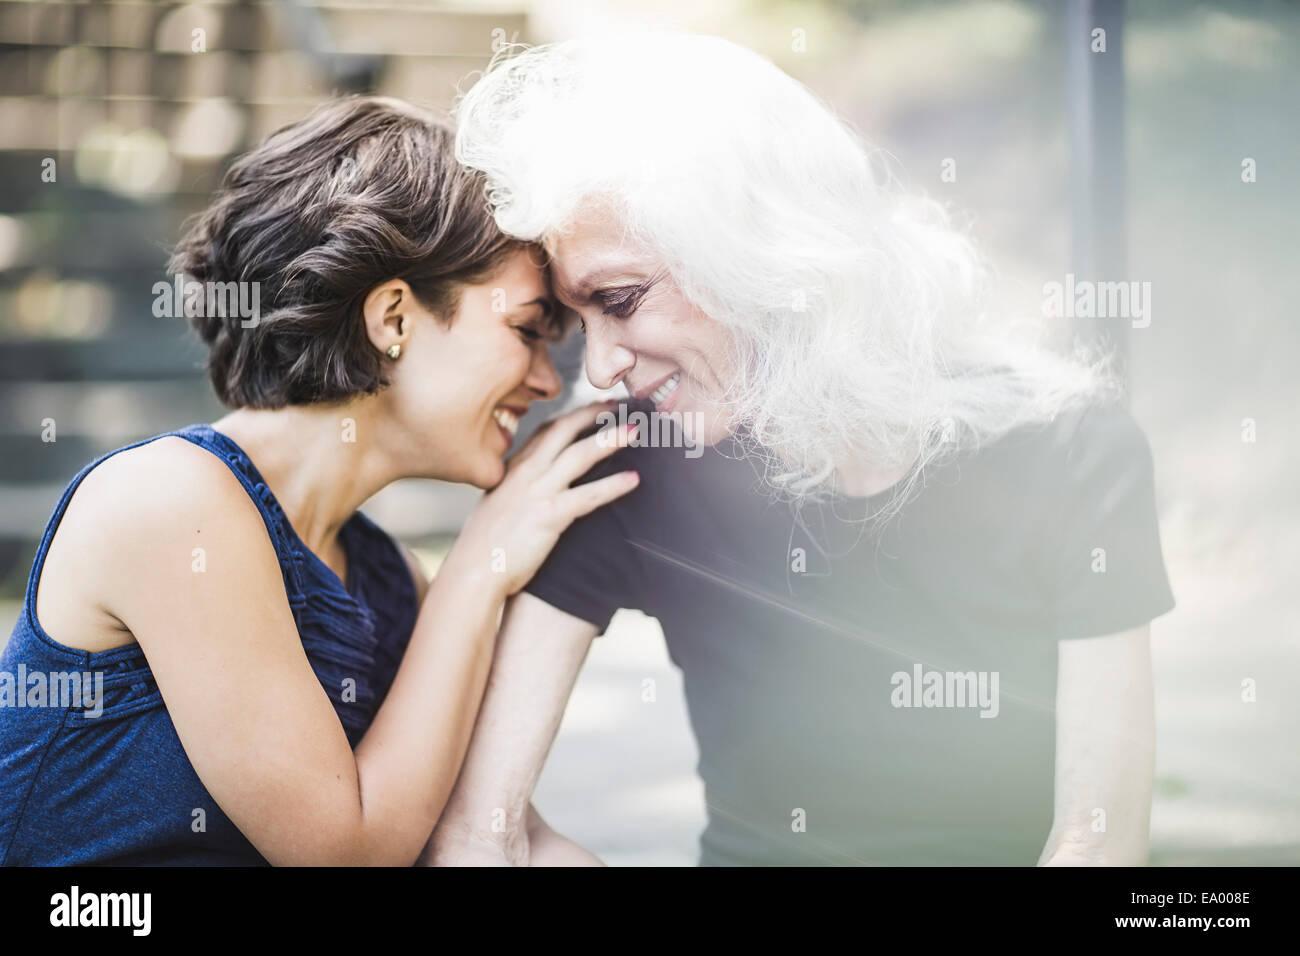 Mujer joven compartir momentos tiernos con mentor Imagen De Stock